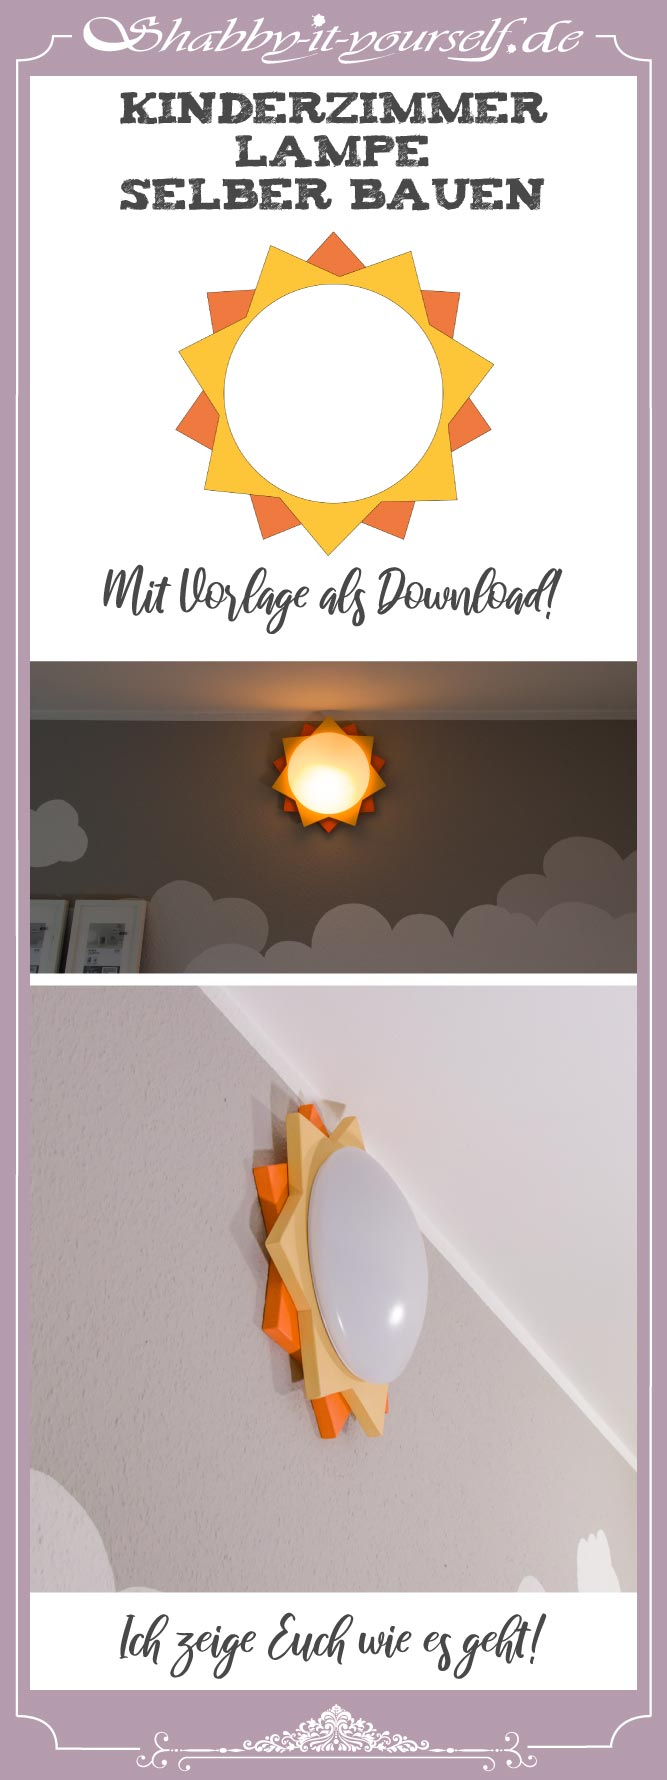 Kinderzimmer Lampe selber bauen - PIN